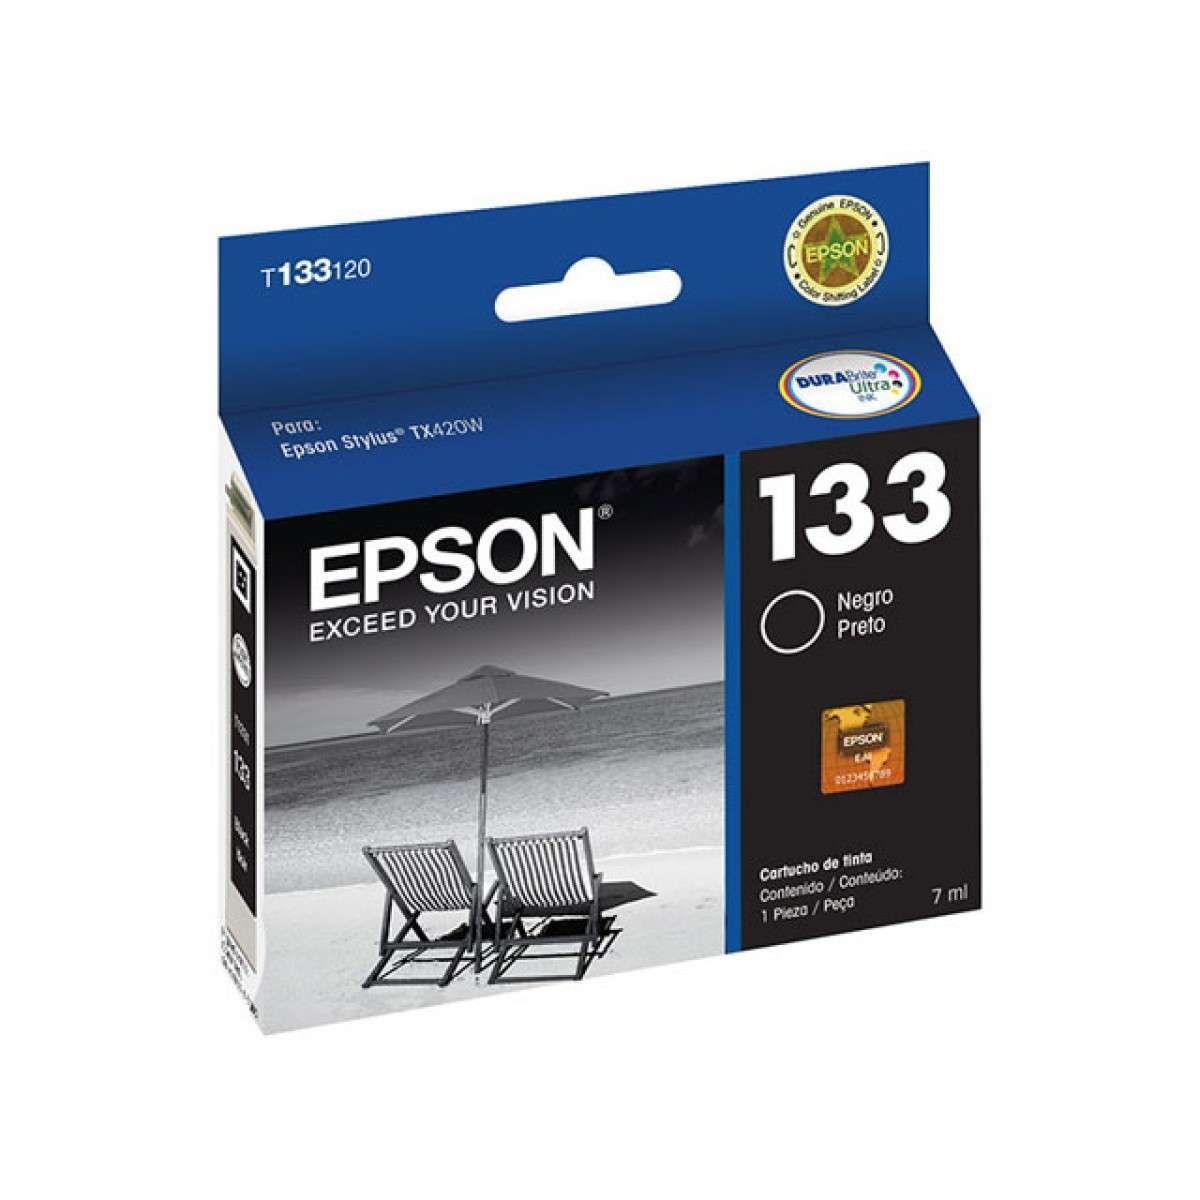 Cartucho de Tinta Epson T133120-Br Preto 5ml